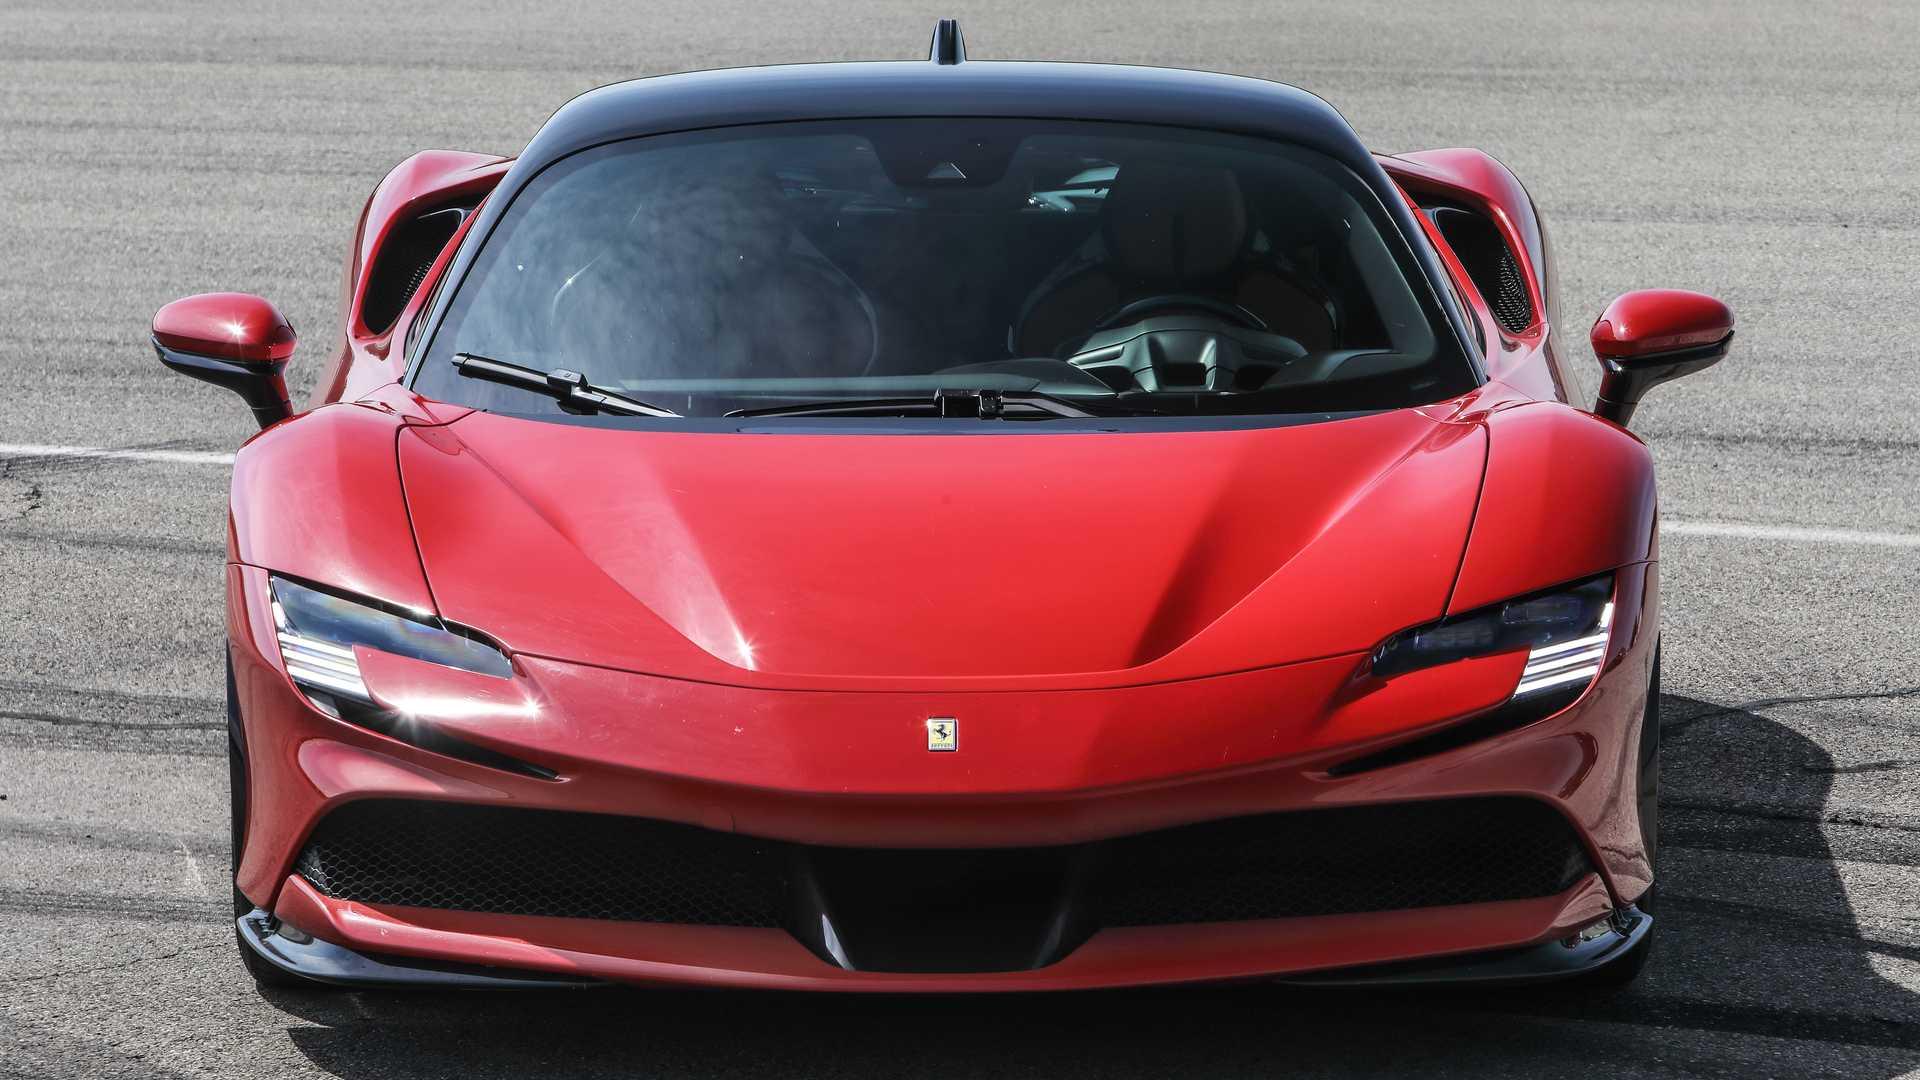 Ferrari SF90 Stradale, the test